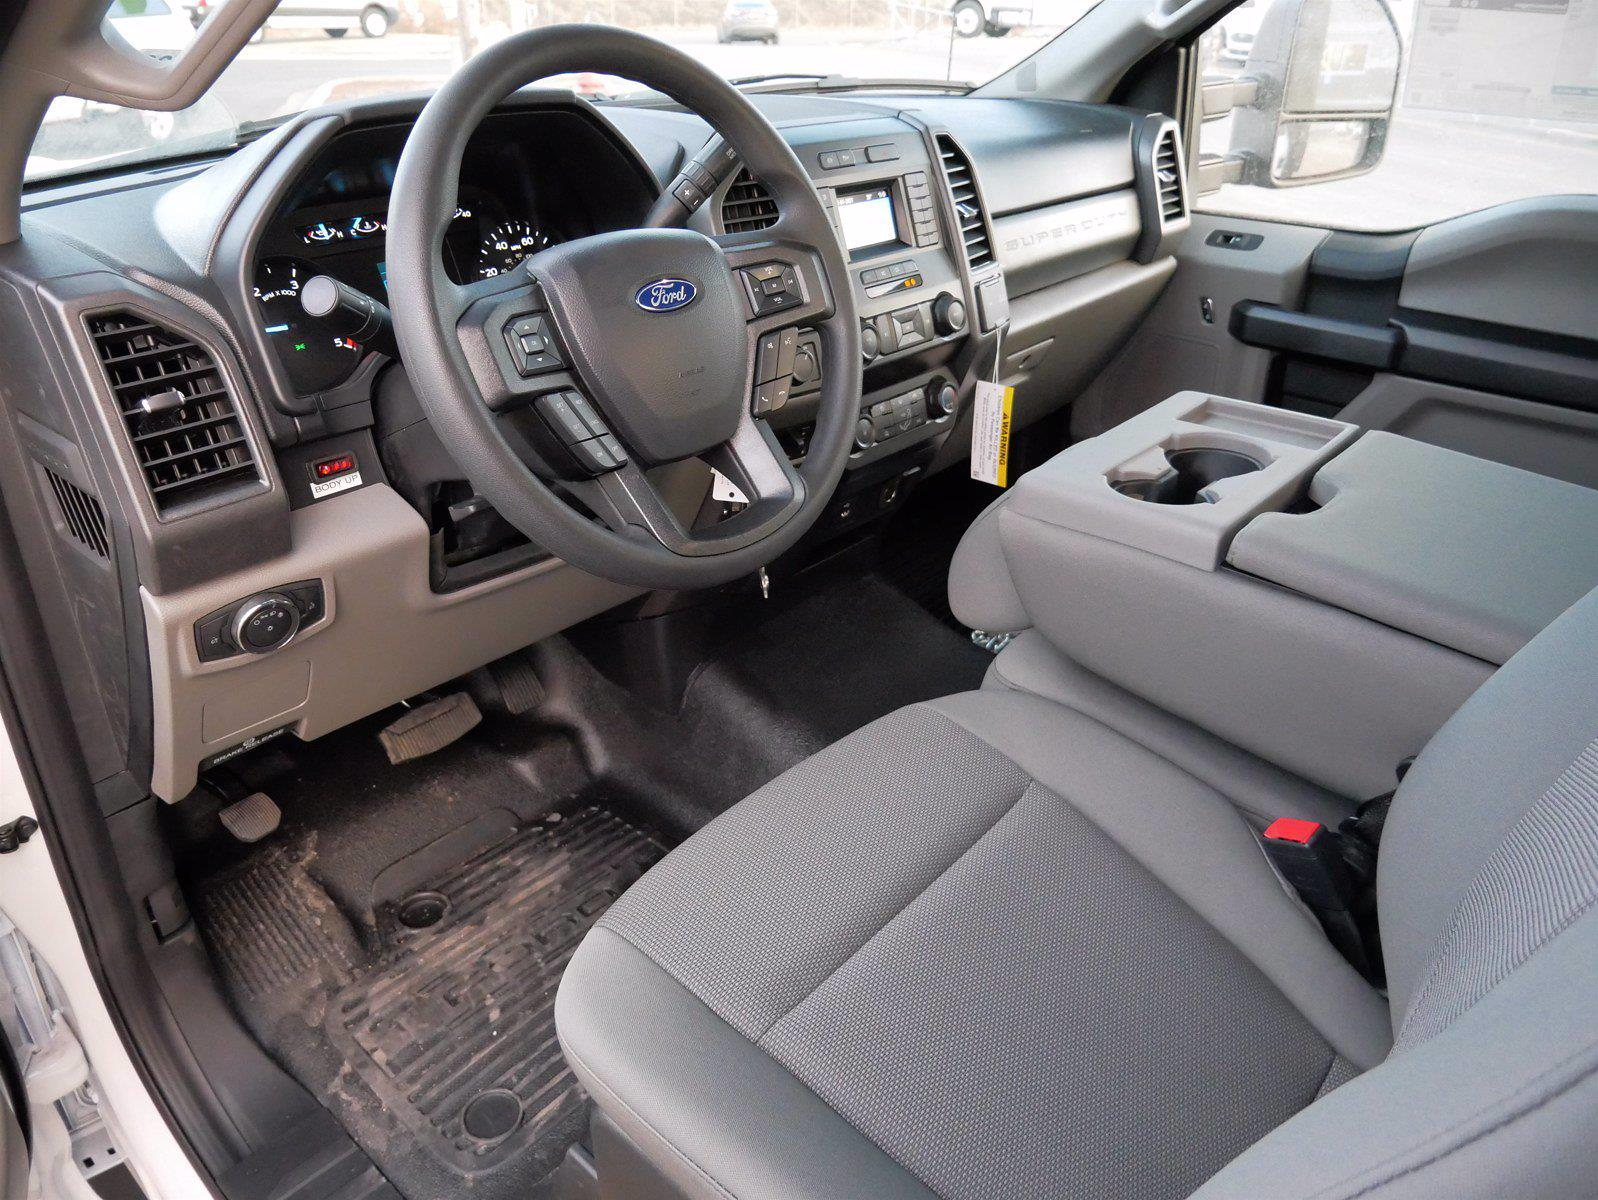 2020 Ford F-550 Regular Cab DRW 4x4, Scelzi Dump Body #63233 - photo 13